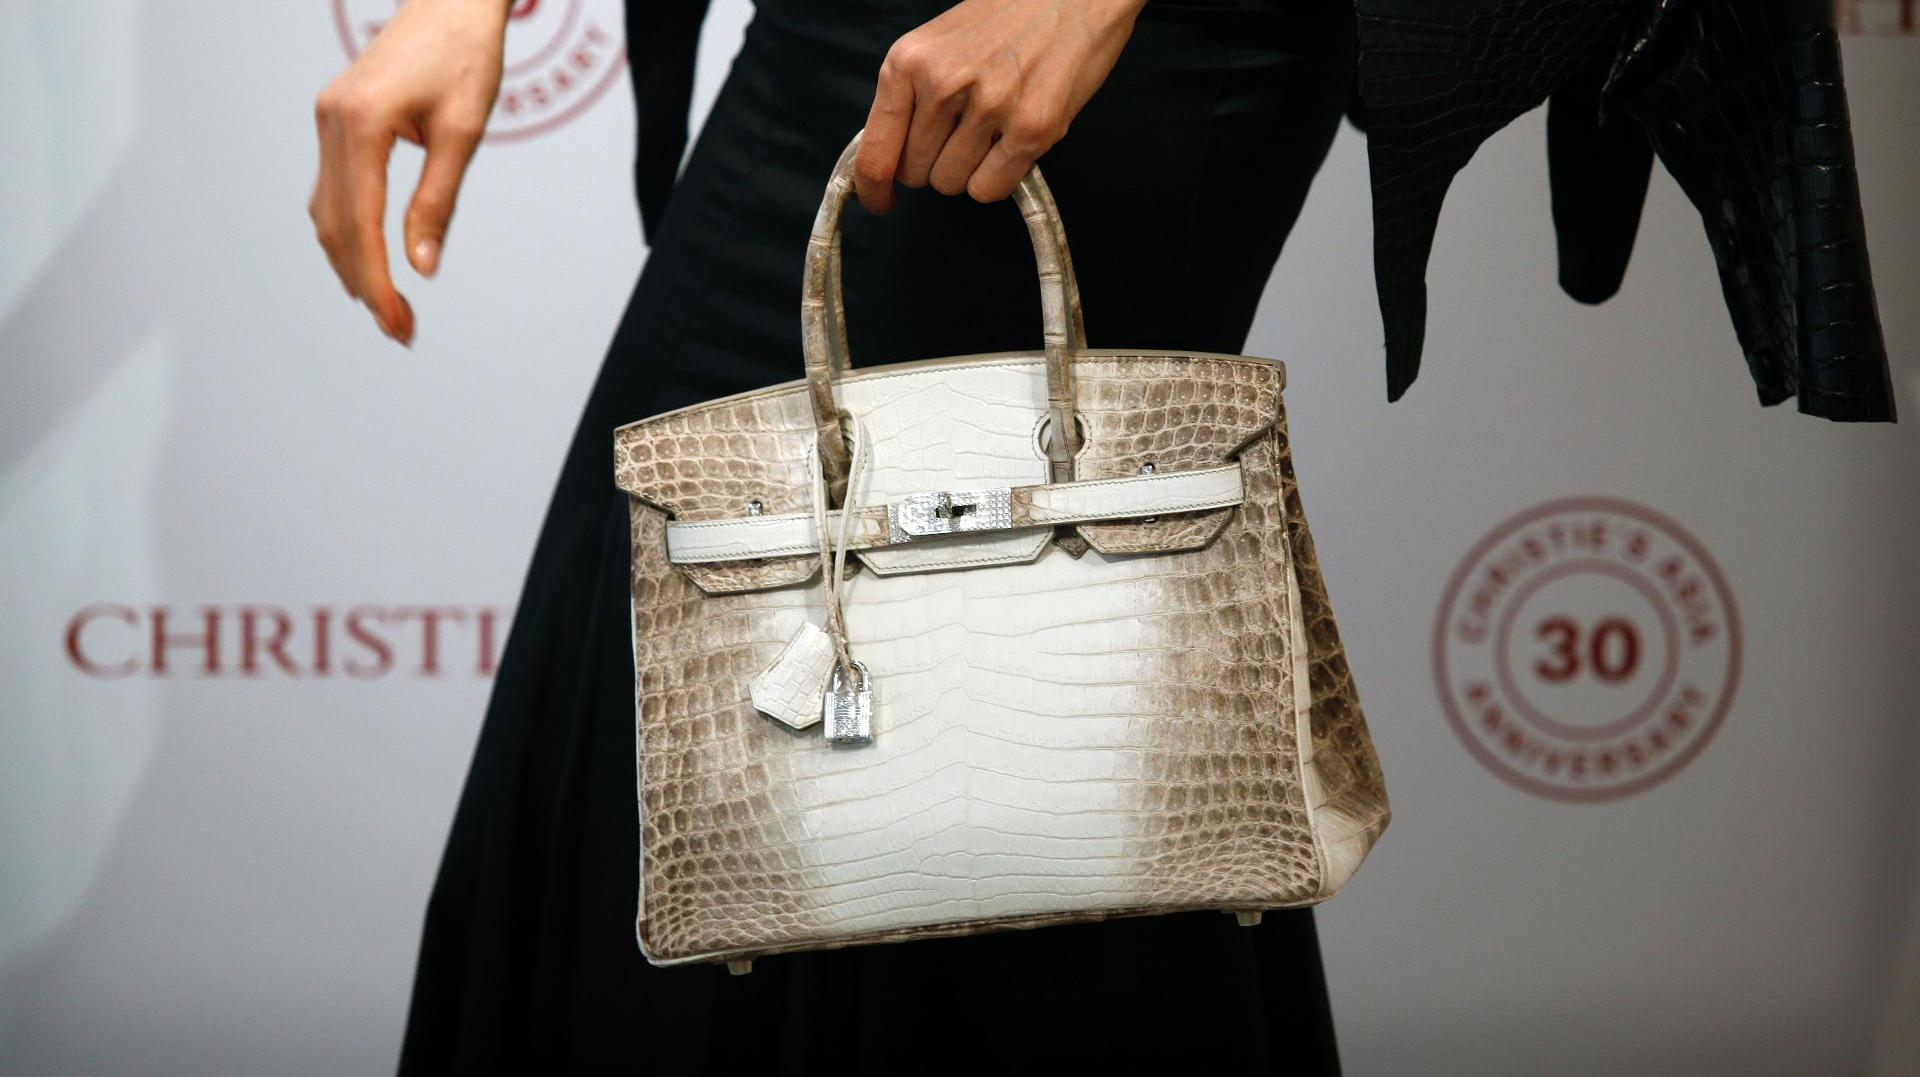 9b3336f5f5a2 Wahnsinn  Die teuerste Birkin Bag der Welt